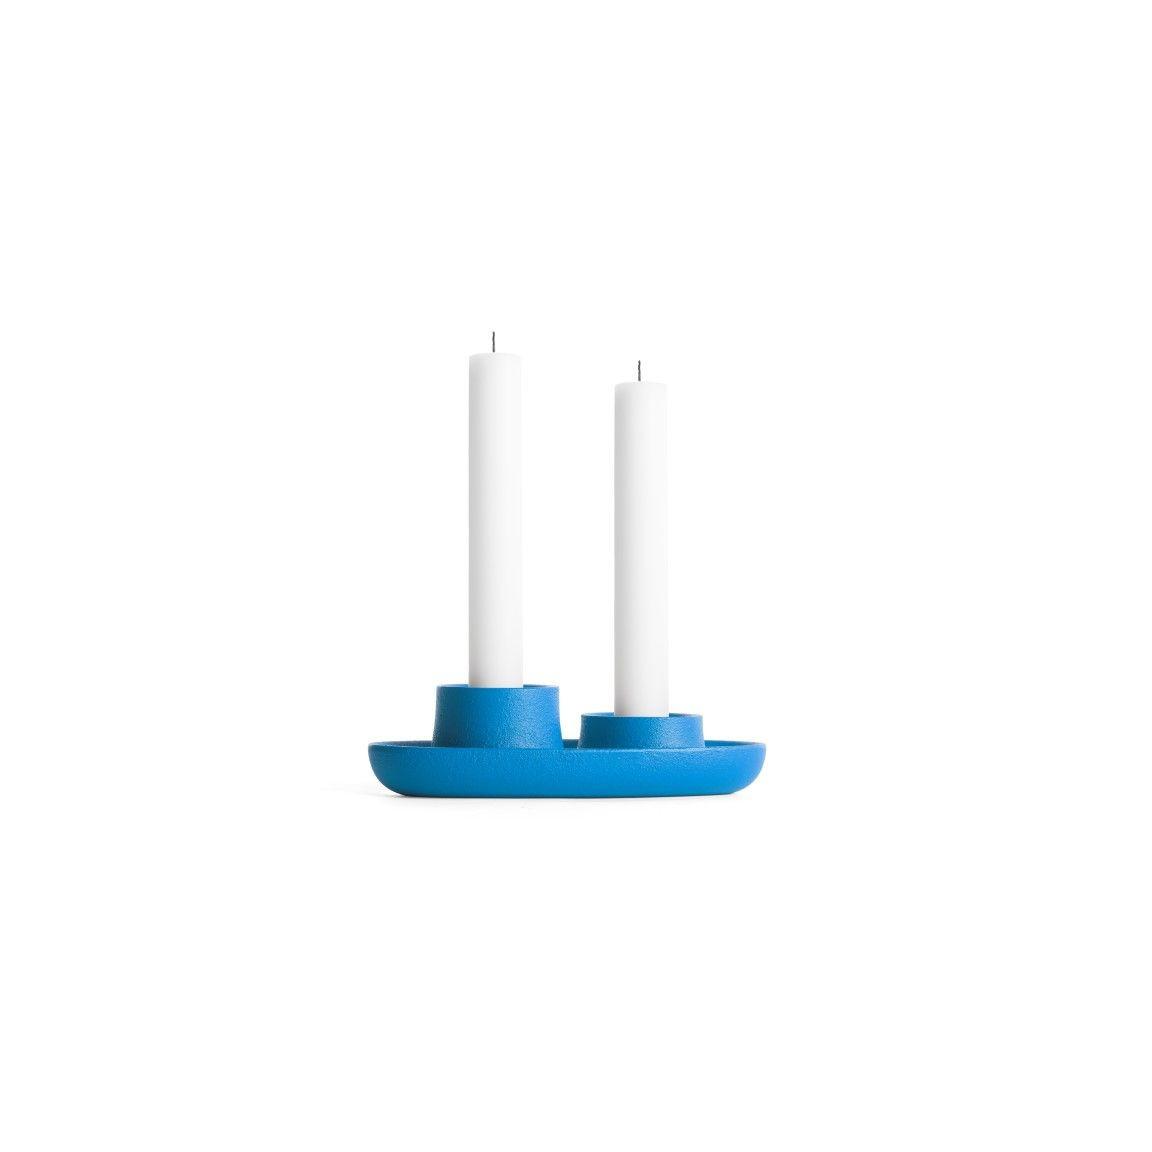 Kerzenhalter für 2 Kerzen   Blau